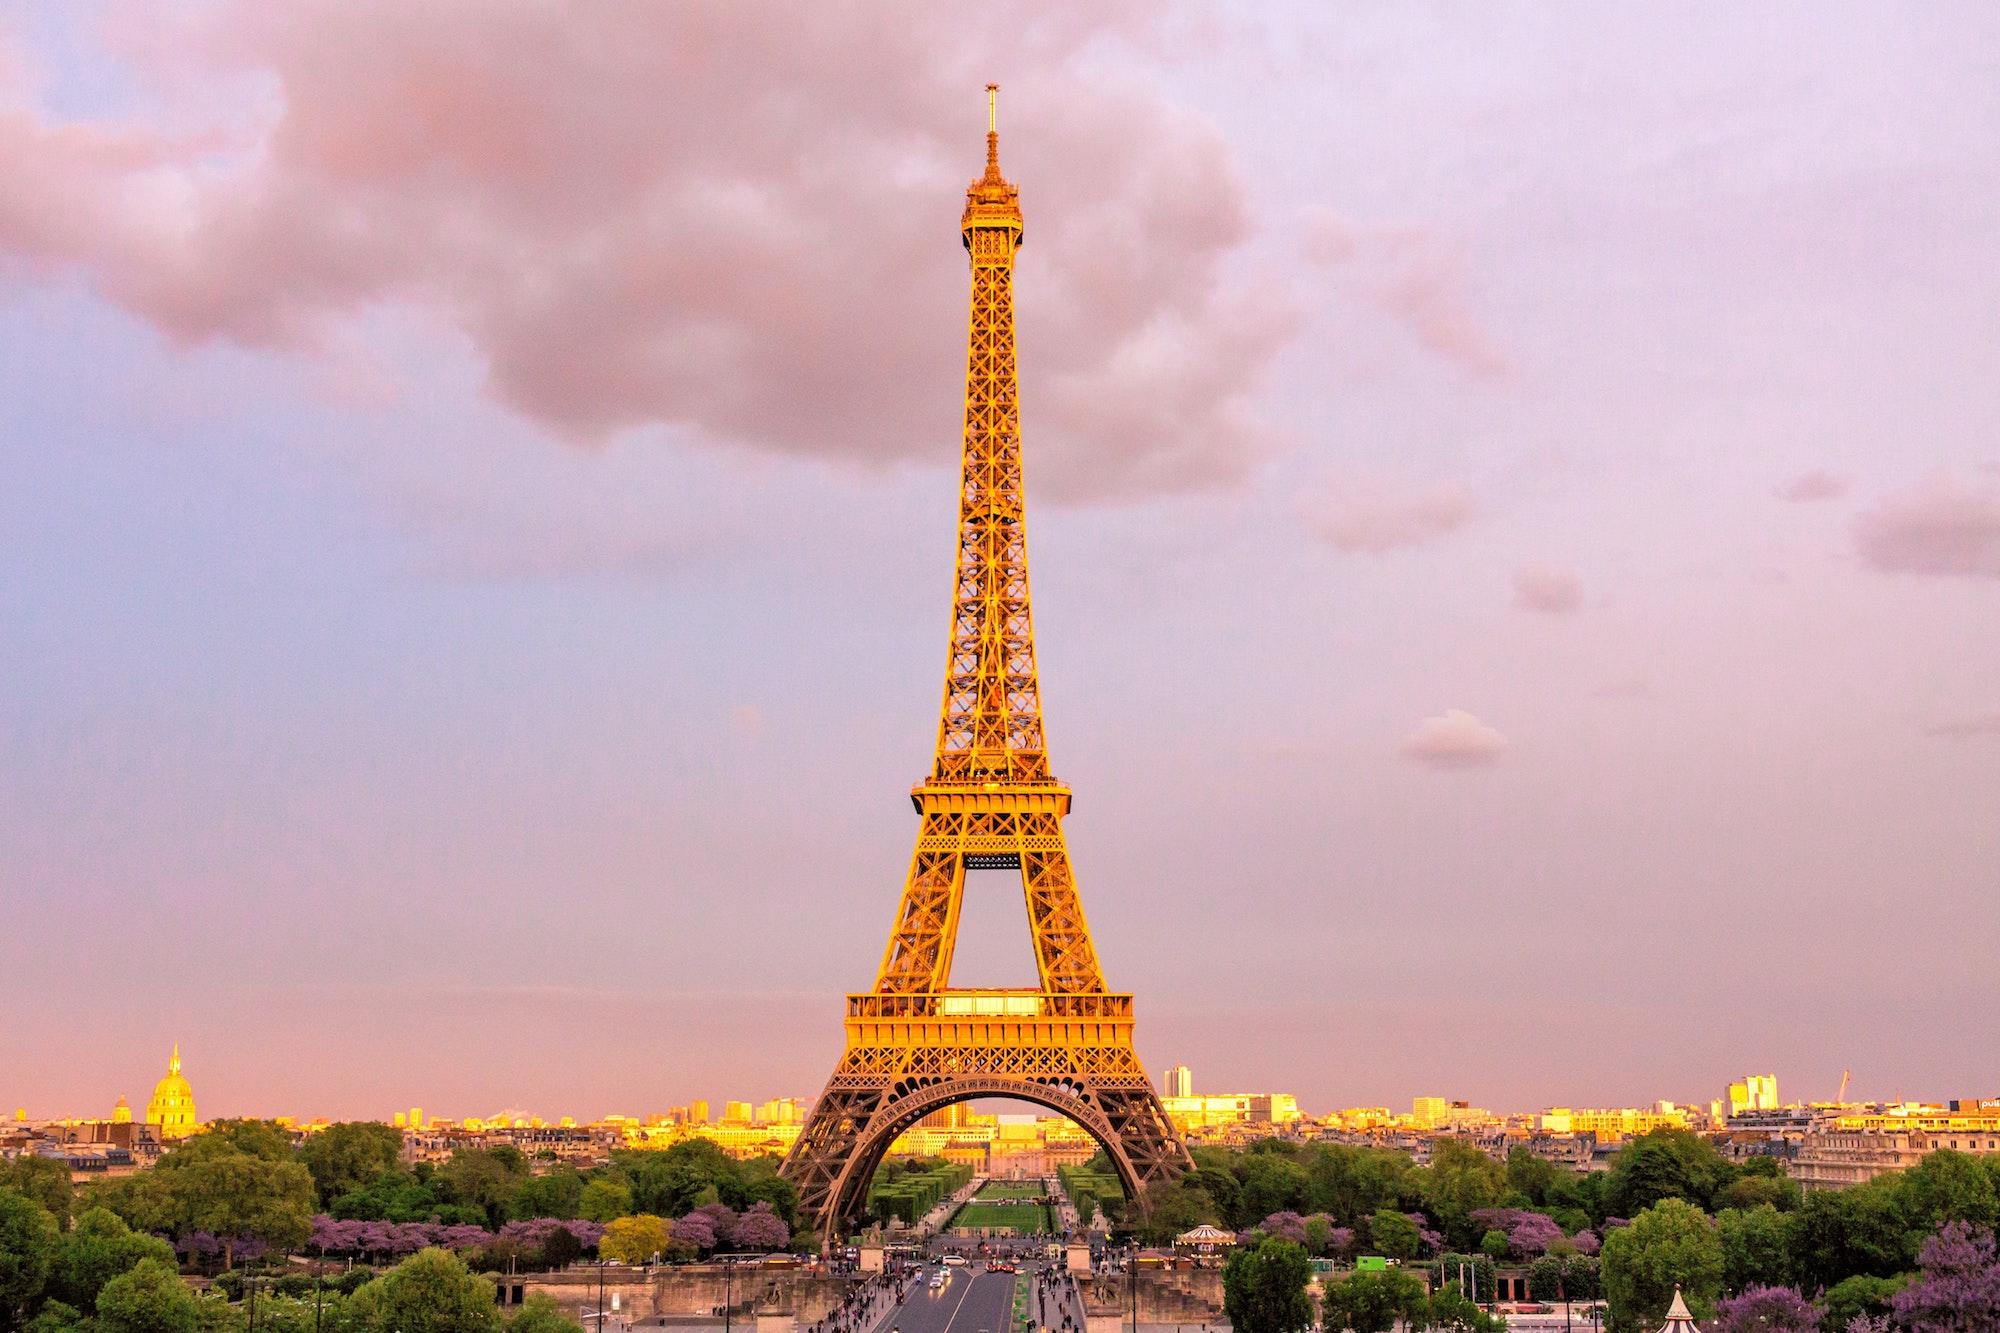 """Eiffel Tower"" as a pronunciation exercise"